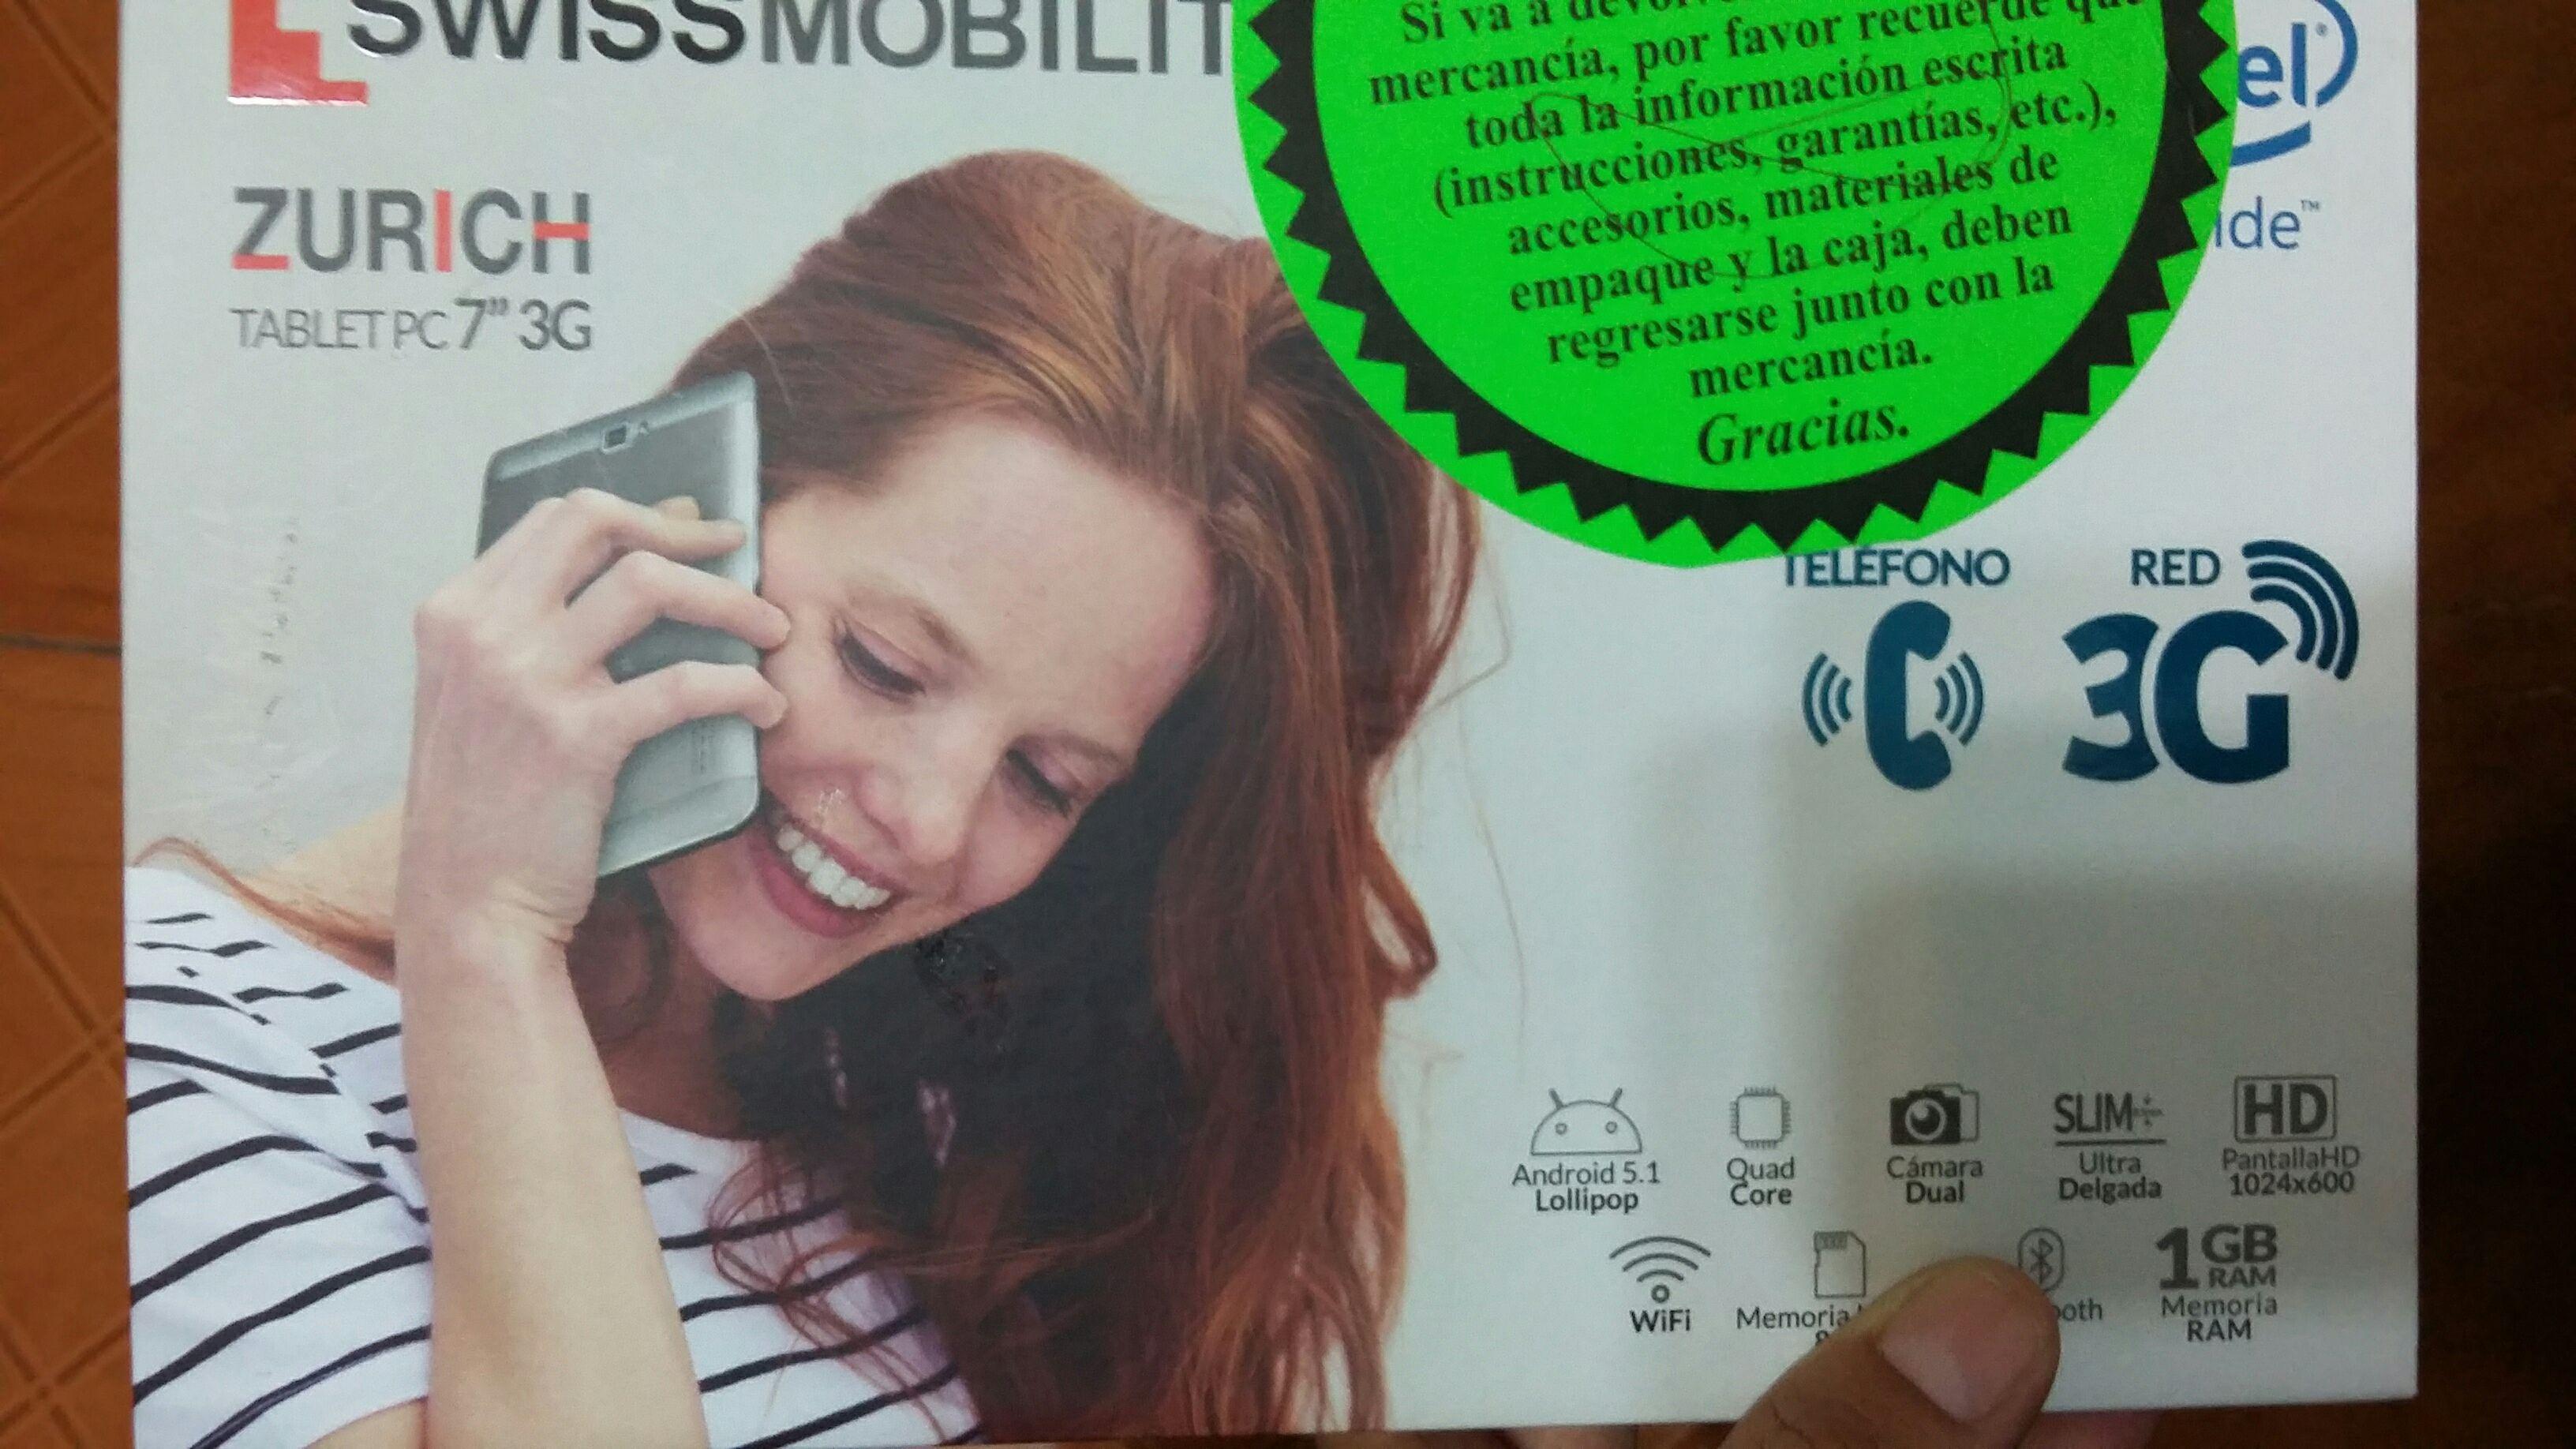 Office Depot: PROTAB marca swissmobilit a $699